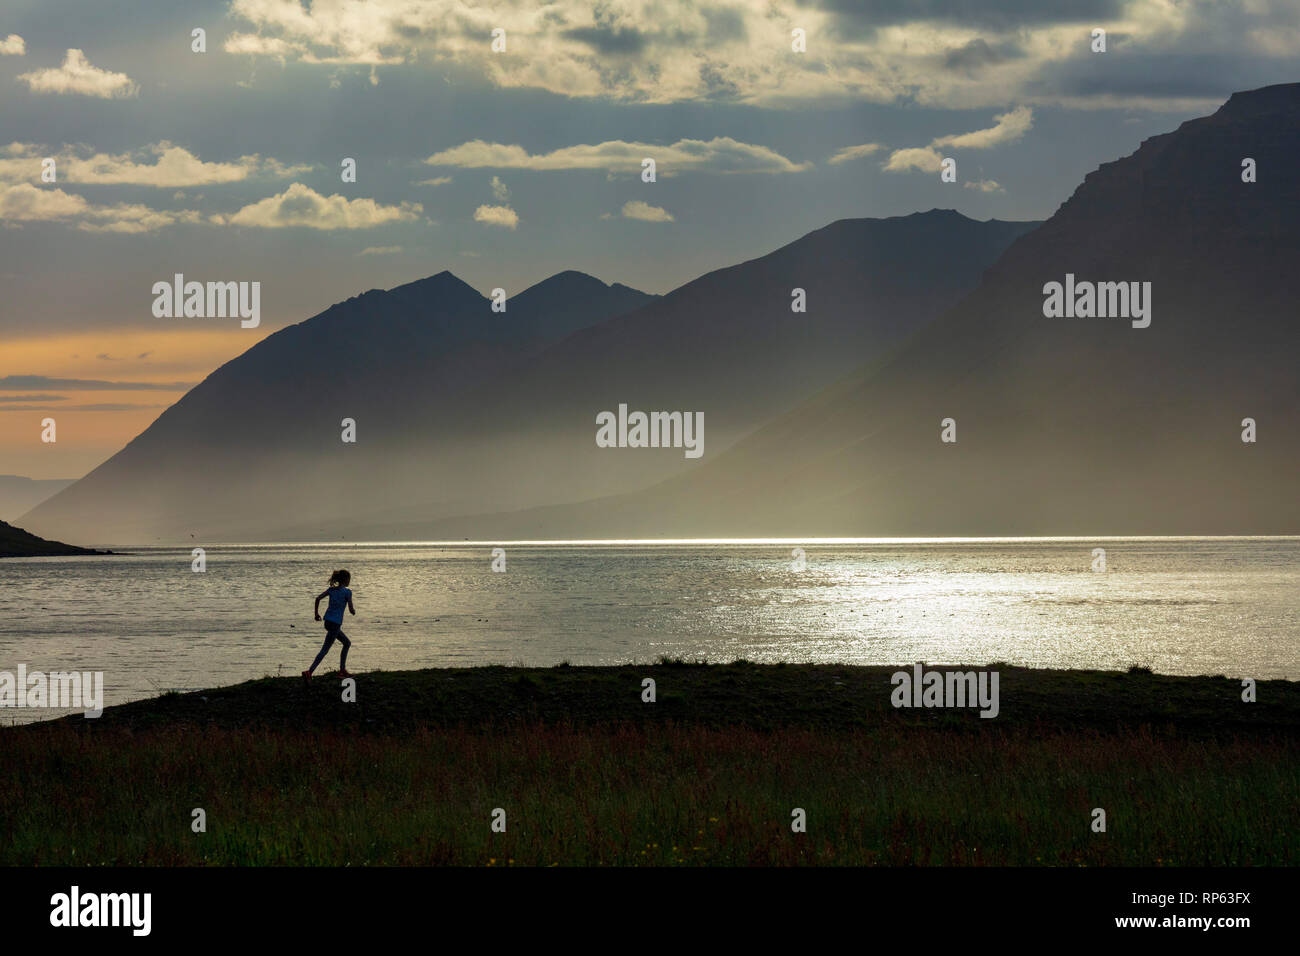 Piscine runner découpé sur Dynjandisvogur, Arnarfjordur, fjord, Islande Westfjords. Photo Stock